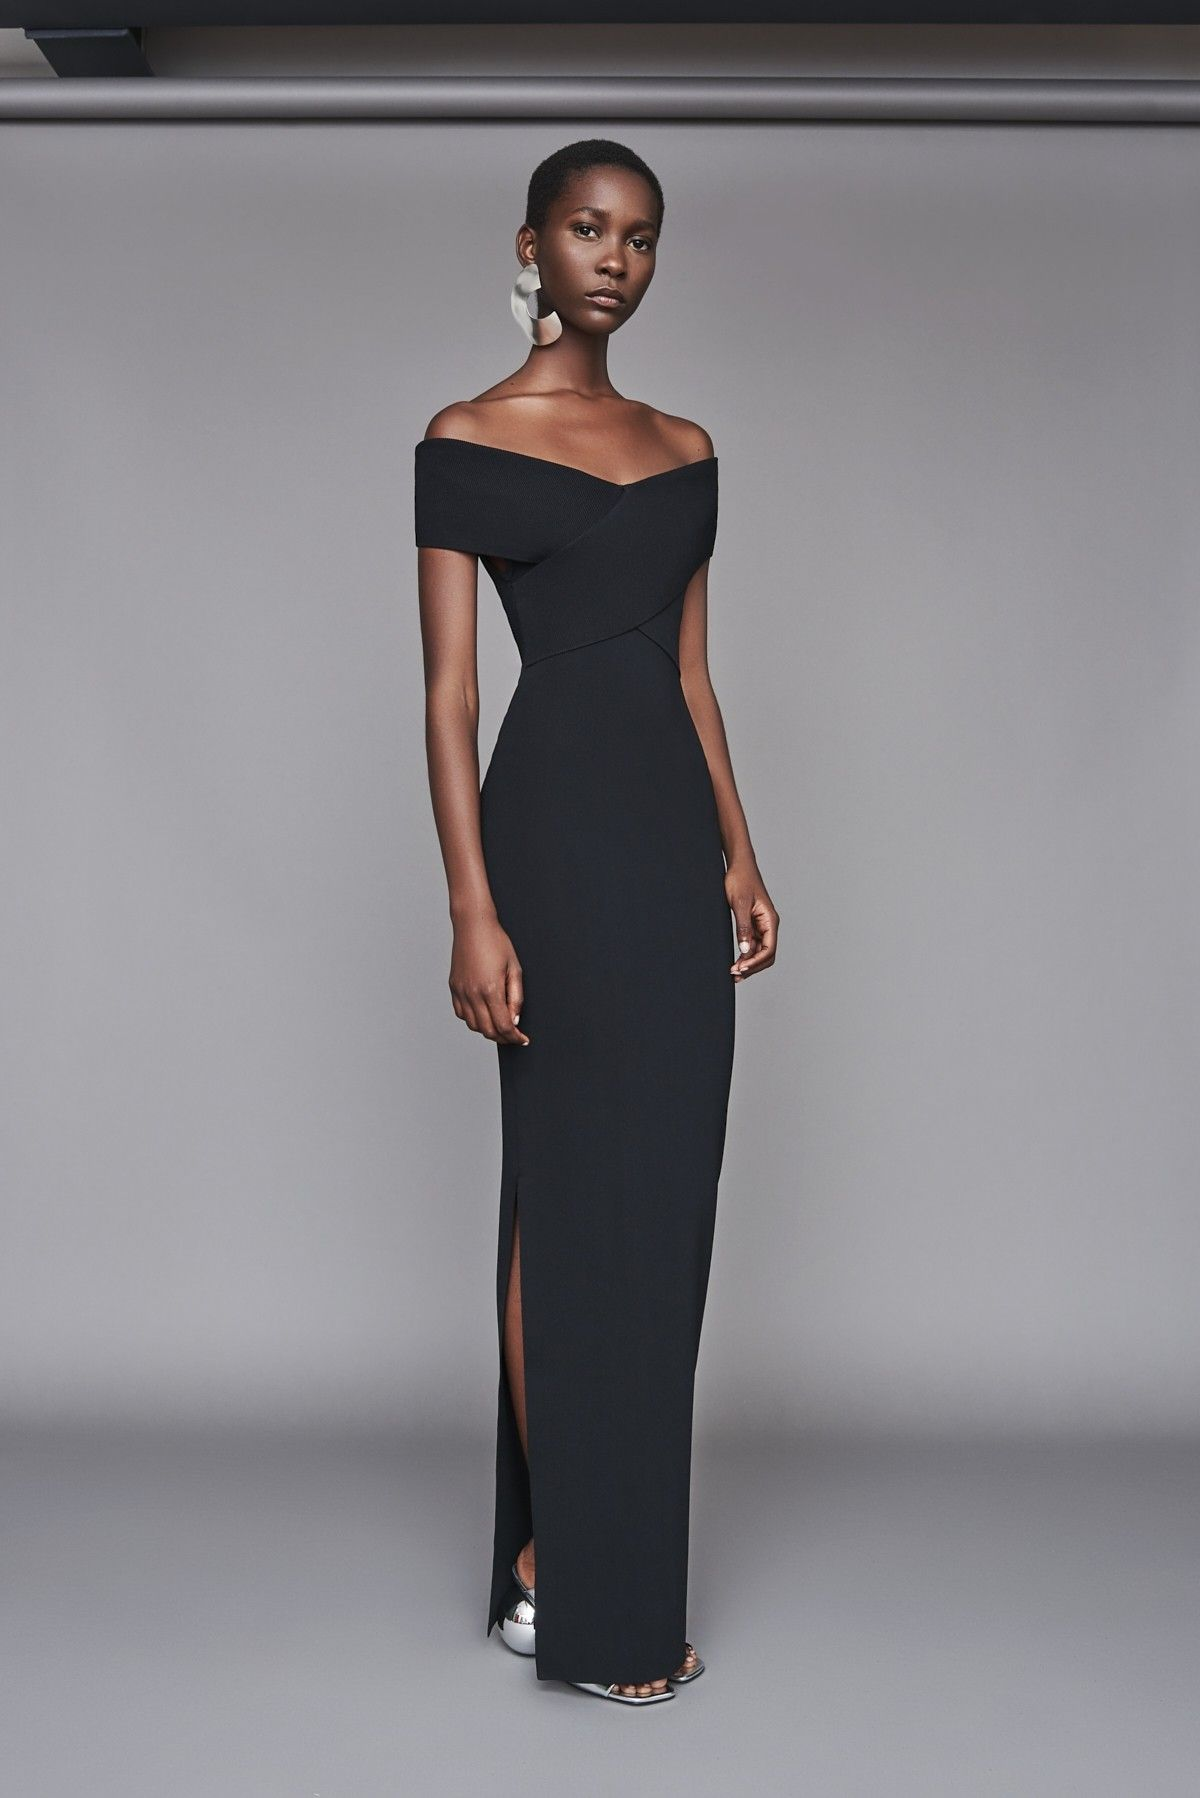 f843cab4d19b Solace London Adina Dress Black   Fancy in 2019   Dresses, Fashion ...